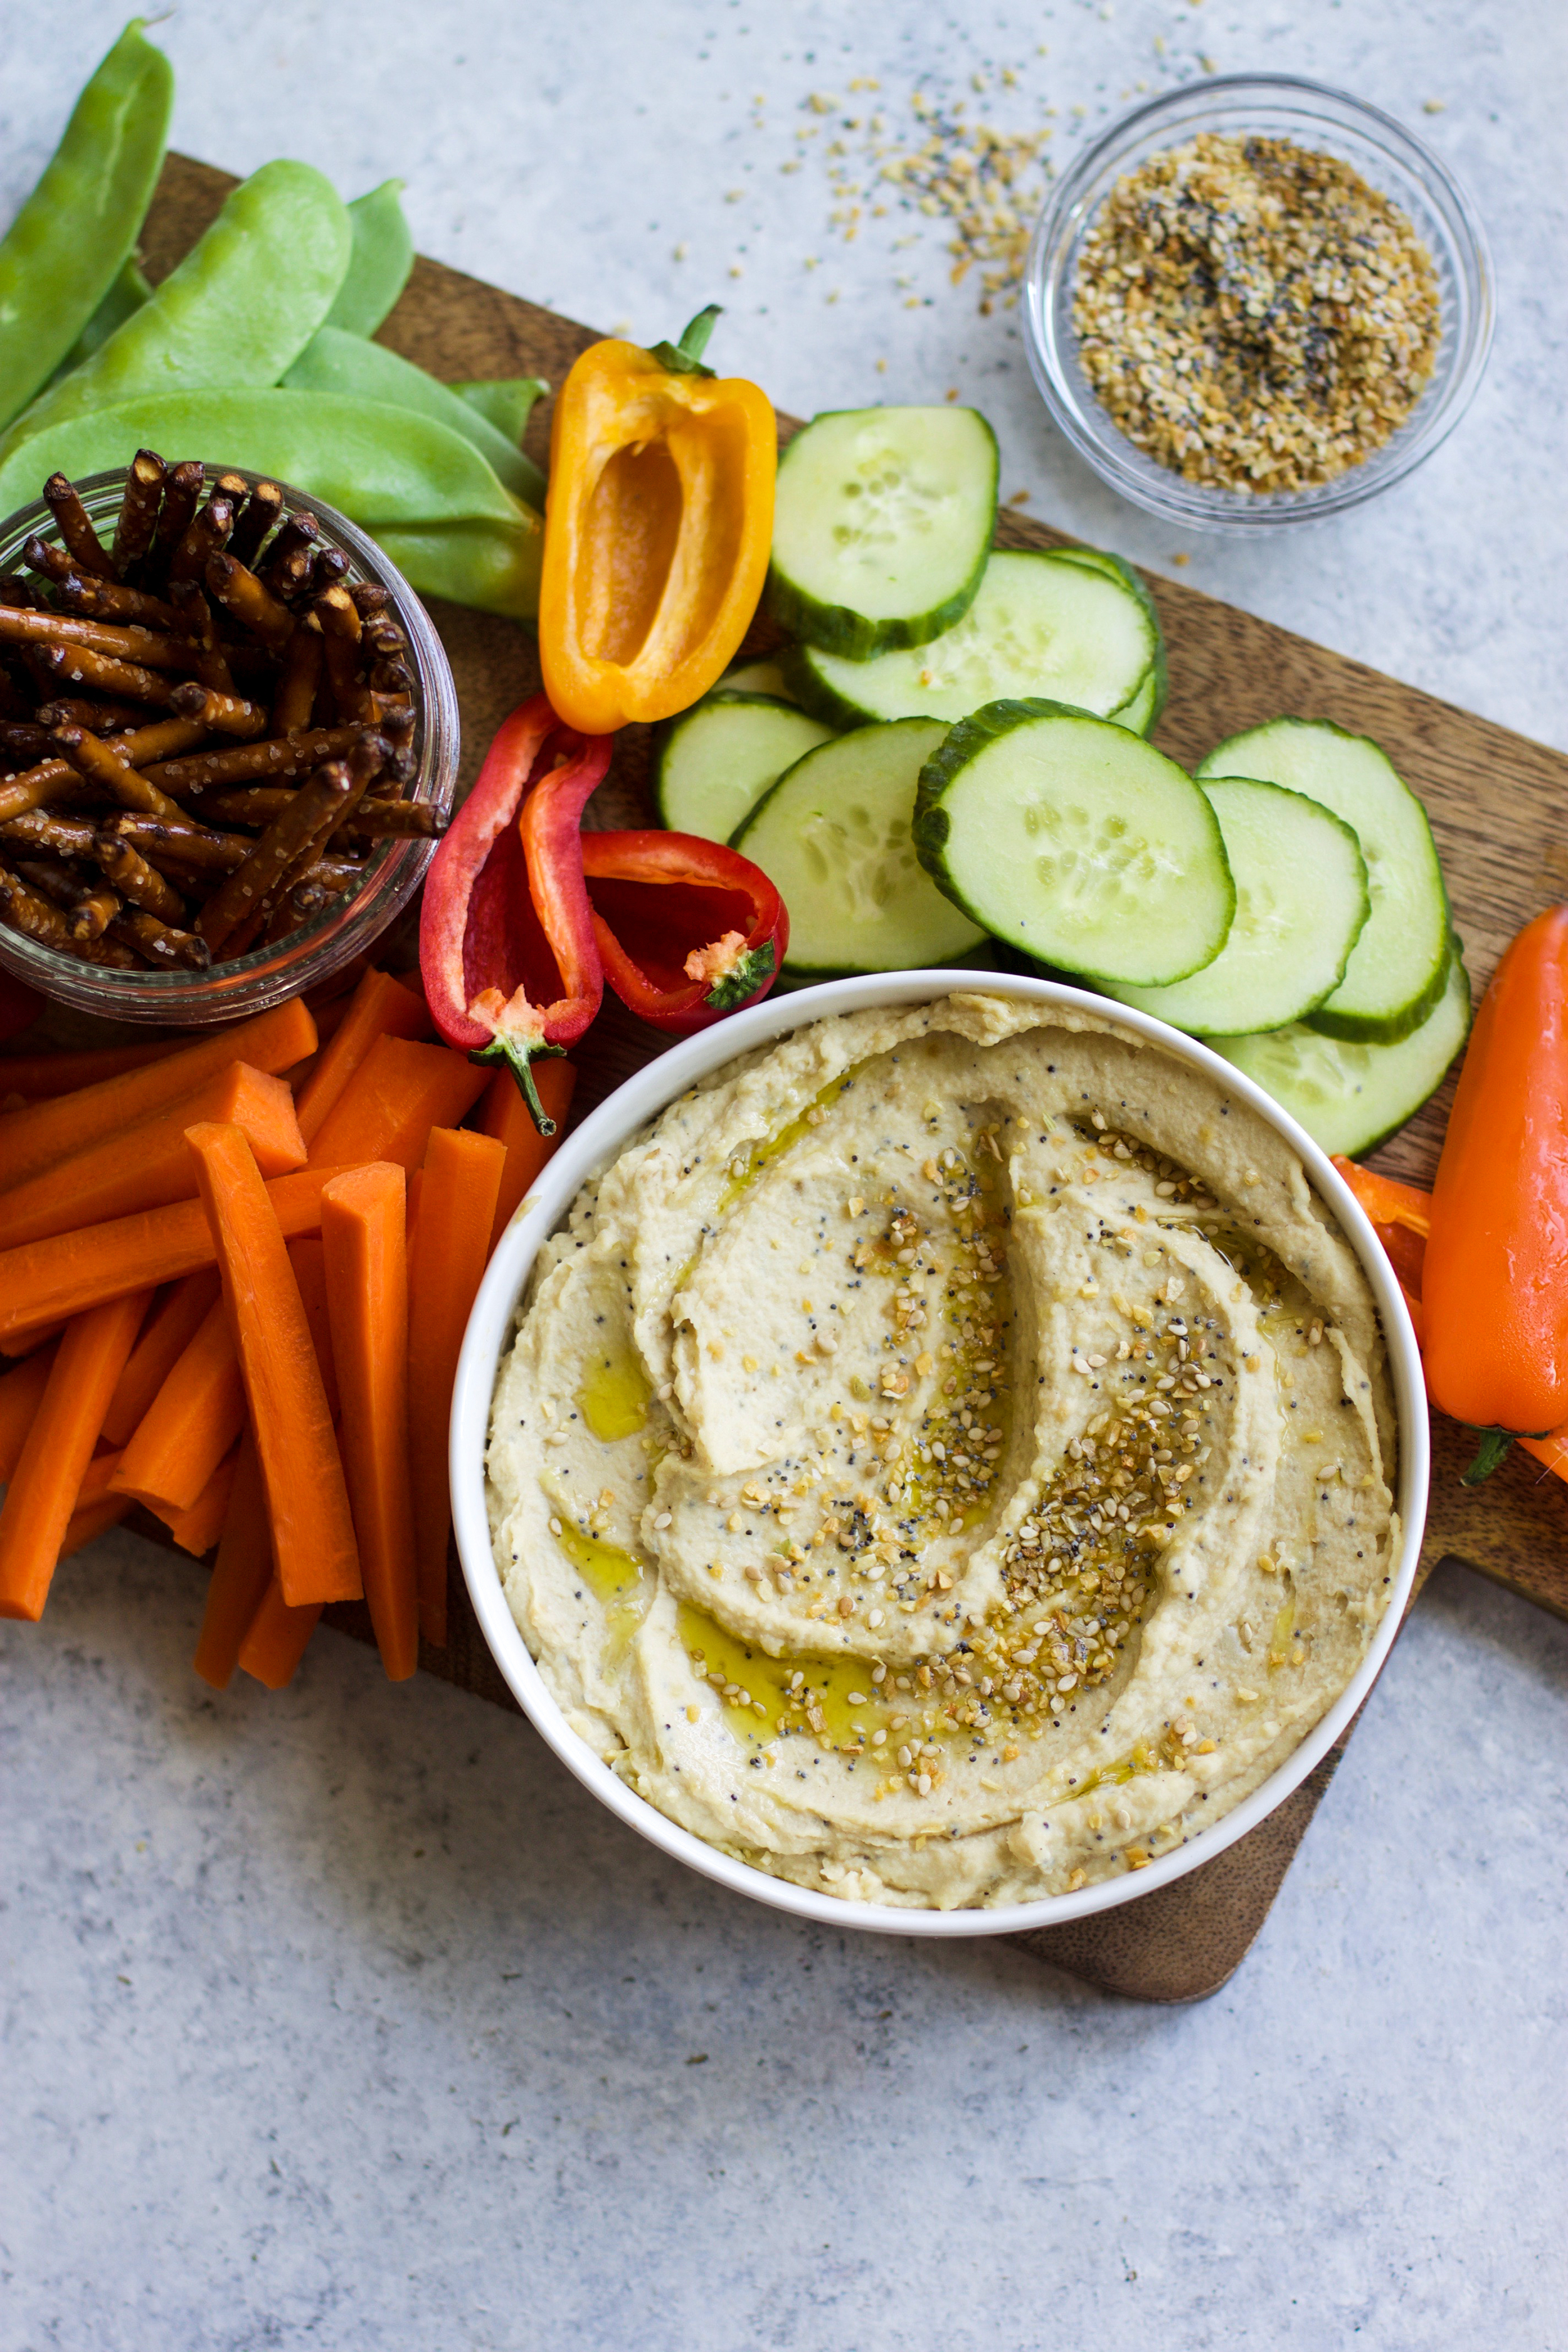 Everything Bagel Hummus: My Diary of Us